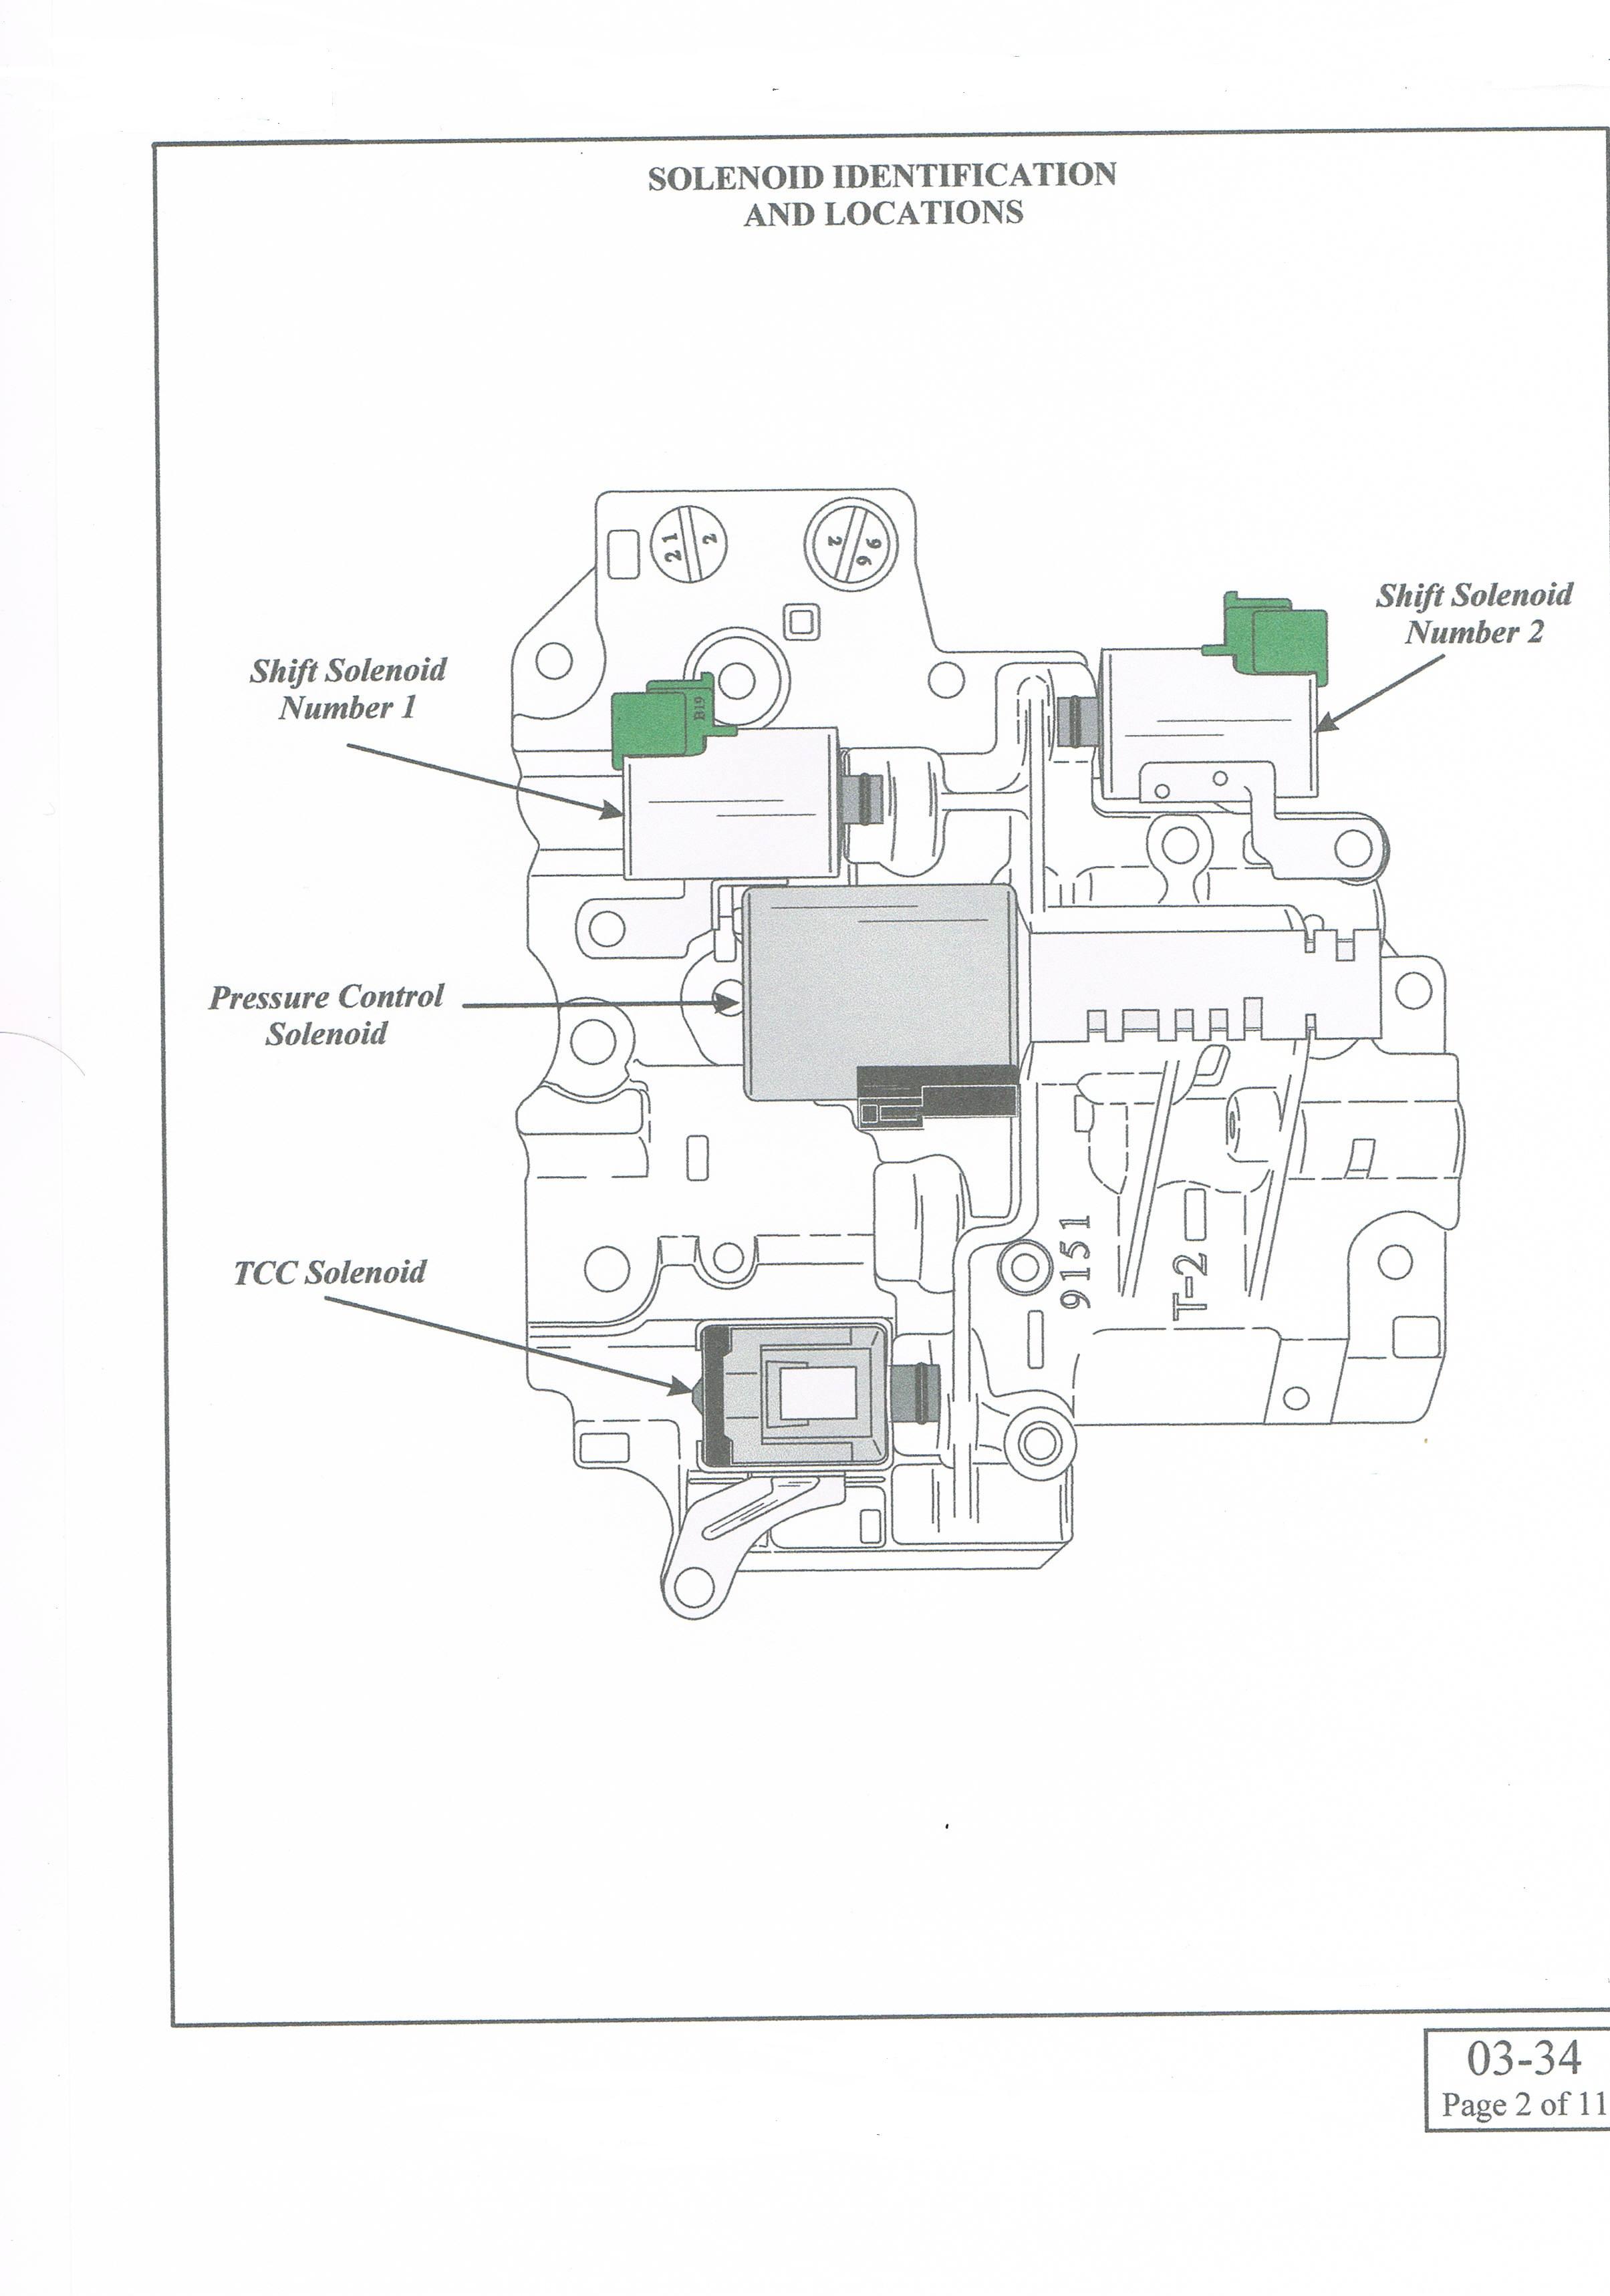 Fiche Technique Voiture 1470 also Toyota Transfer Case Diagram likewise Matriser moreover 2004 Saab 9 3 Audio Wiring Diagram moreover Wiring Diagrams For 2006 Jeep  mander. on saab 9 5